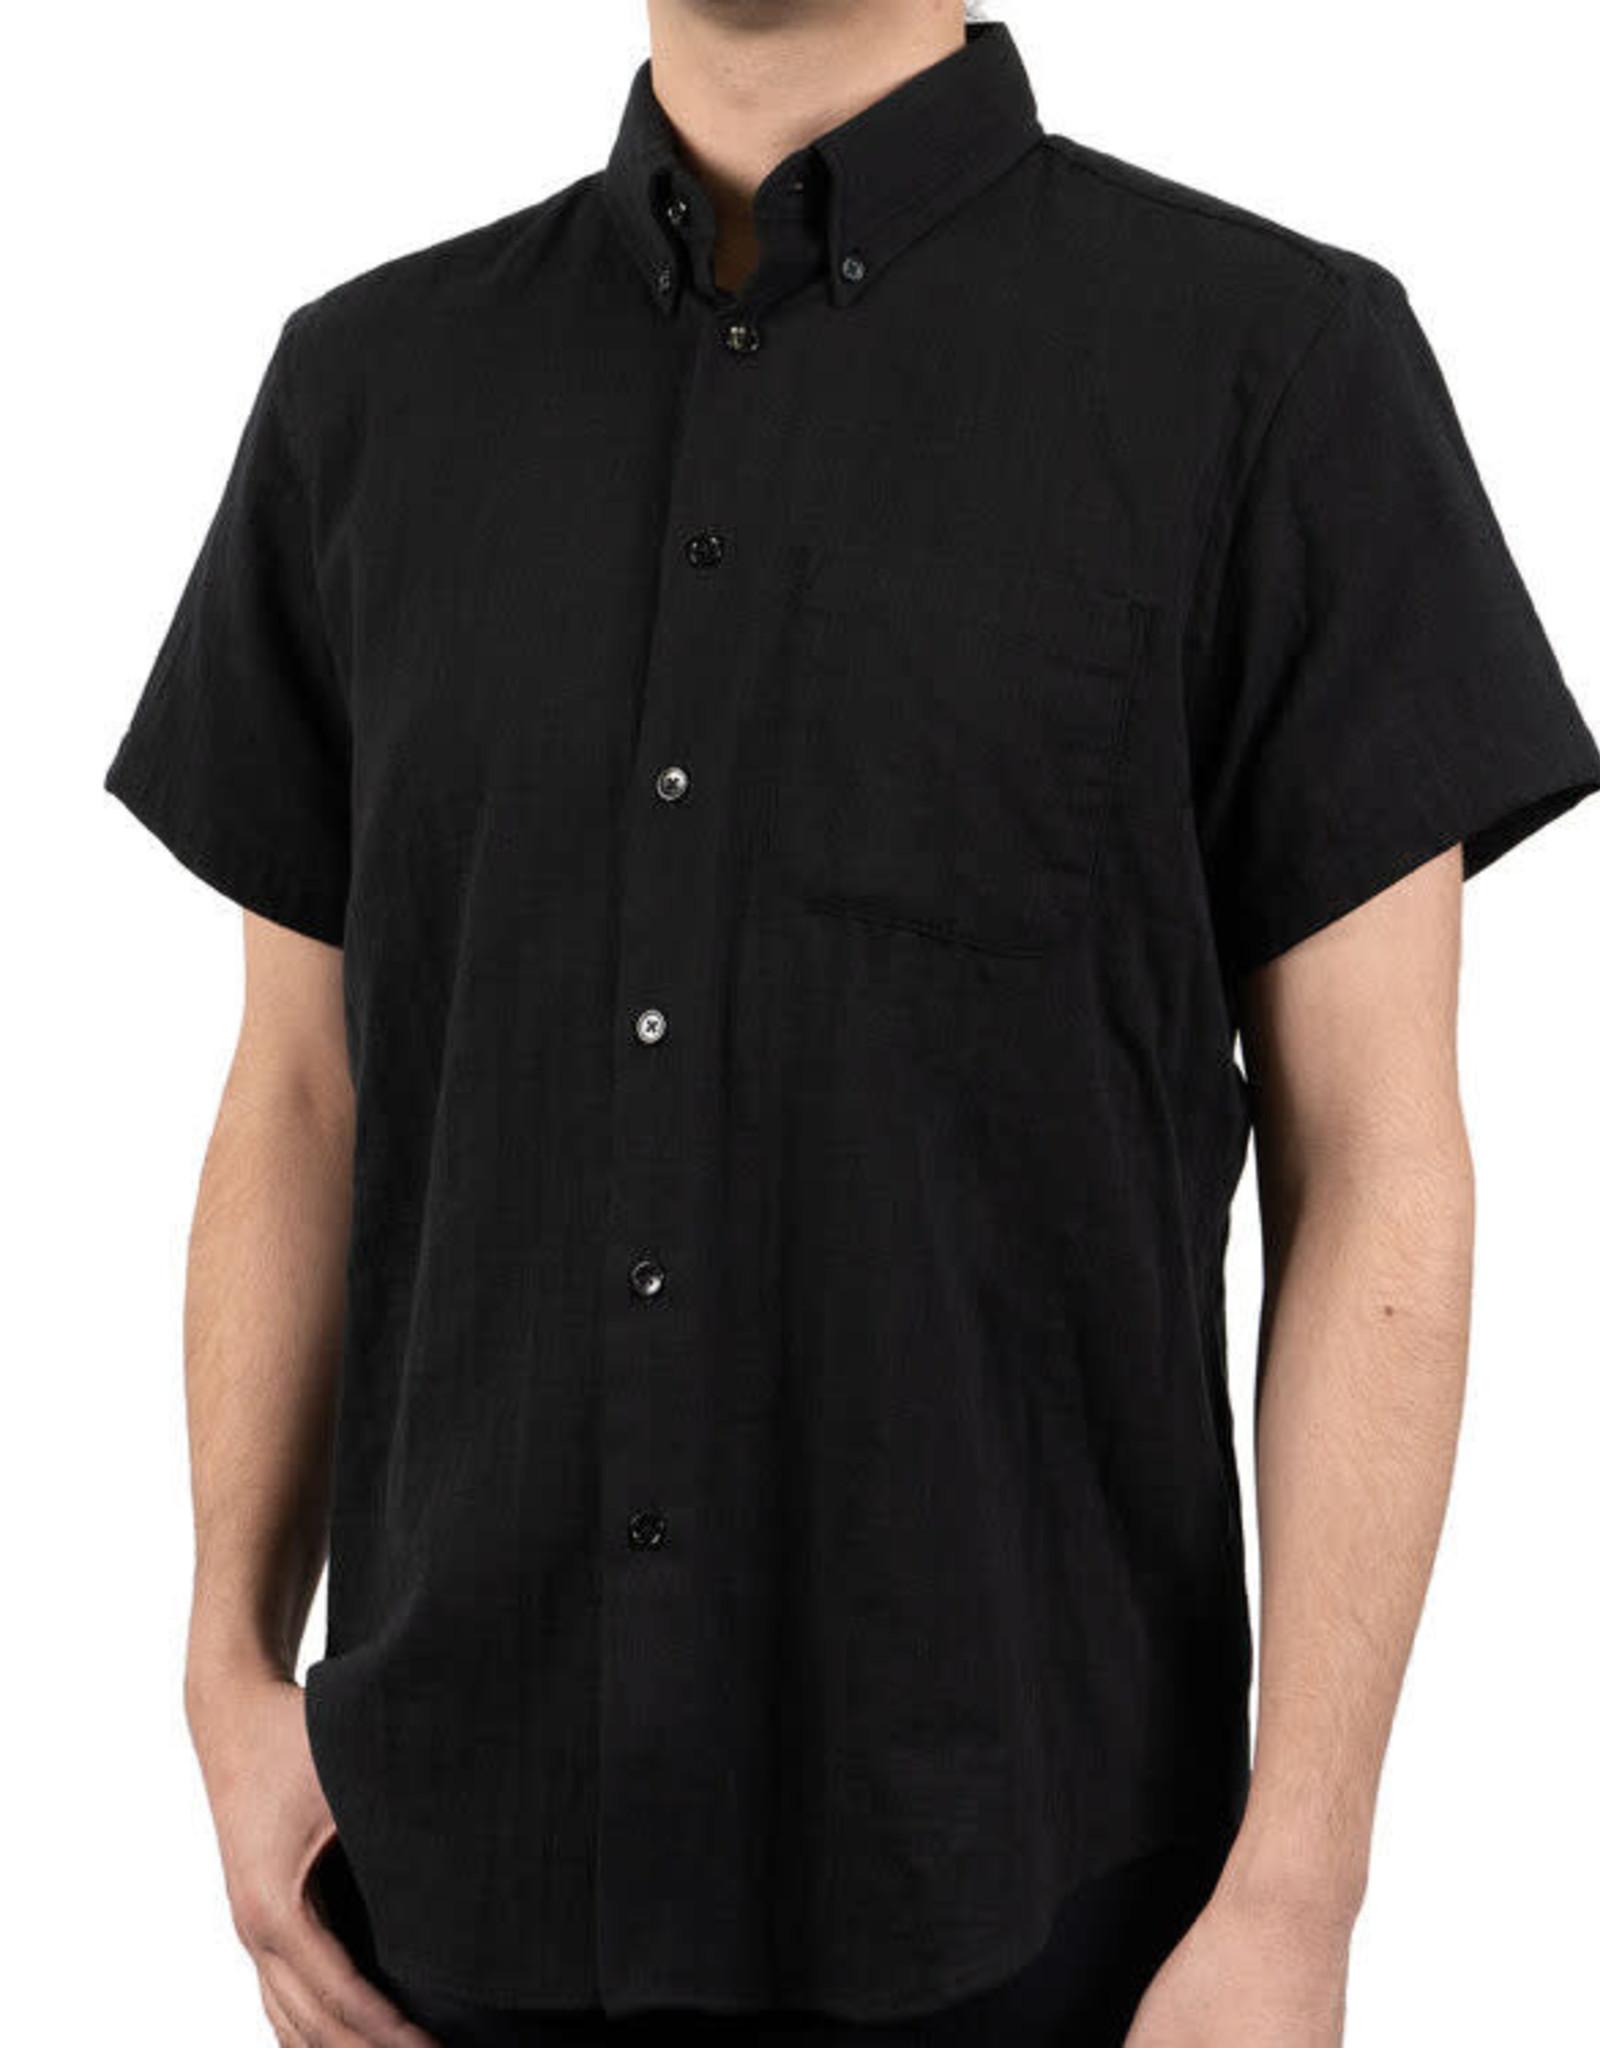 Naked and Famous Easy Shirt PE20 Naked & Famous Double Weave Gauze Black